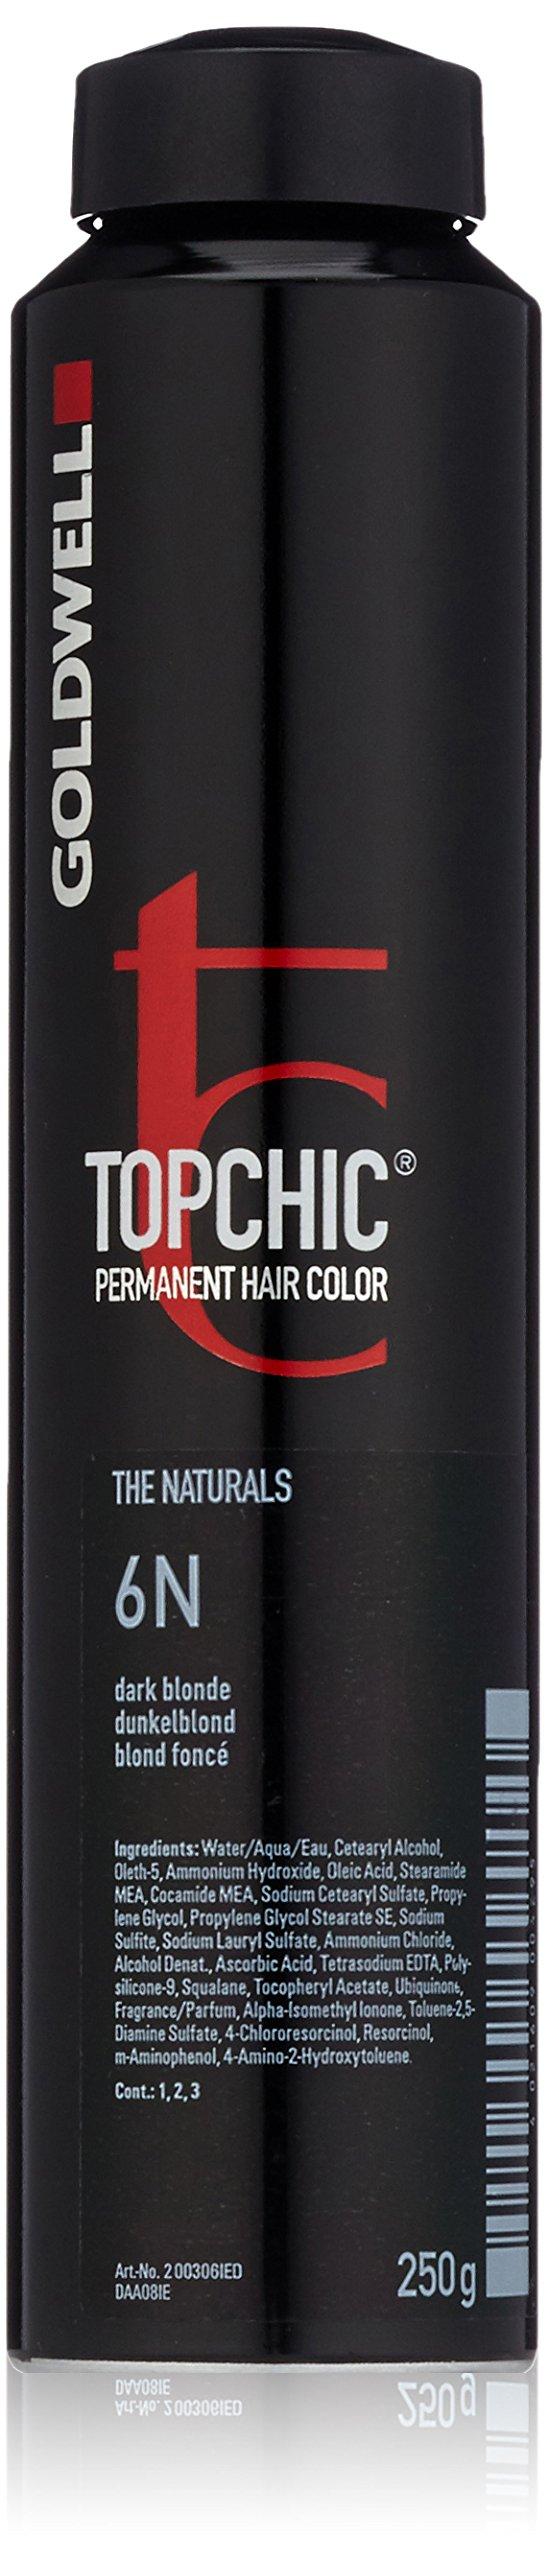 Goldwell Topchic Hair Color, 6n Dark Blonde, 8.6